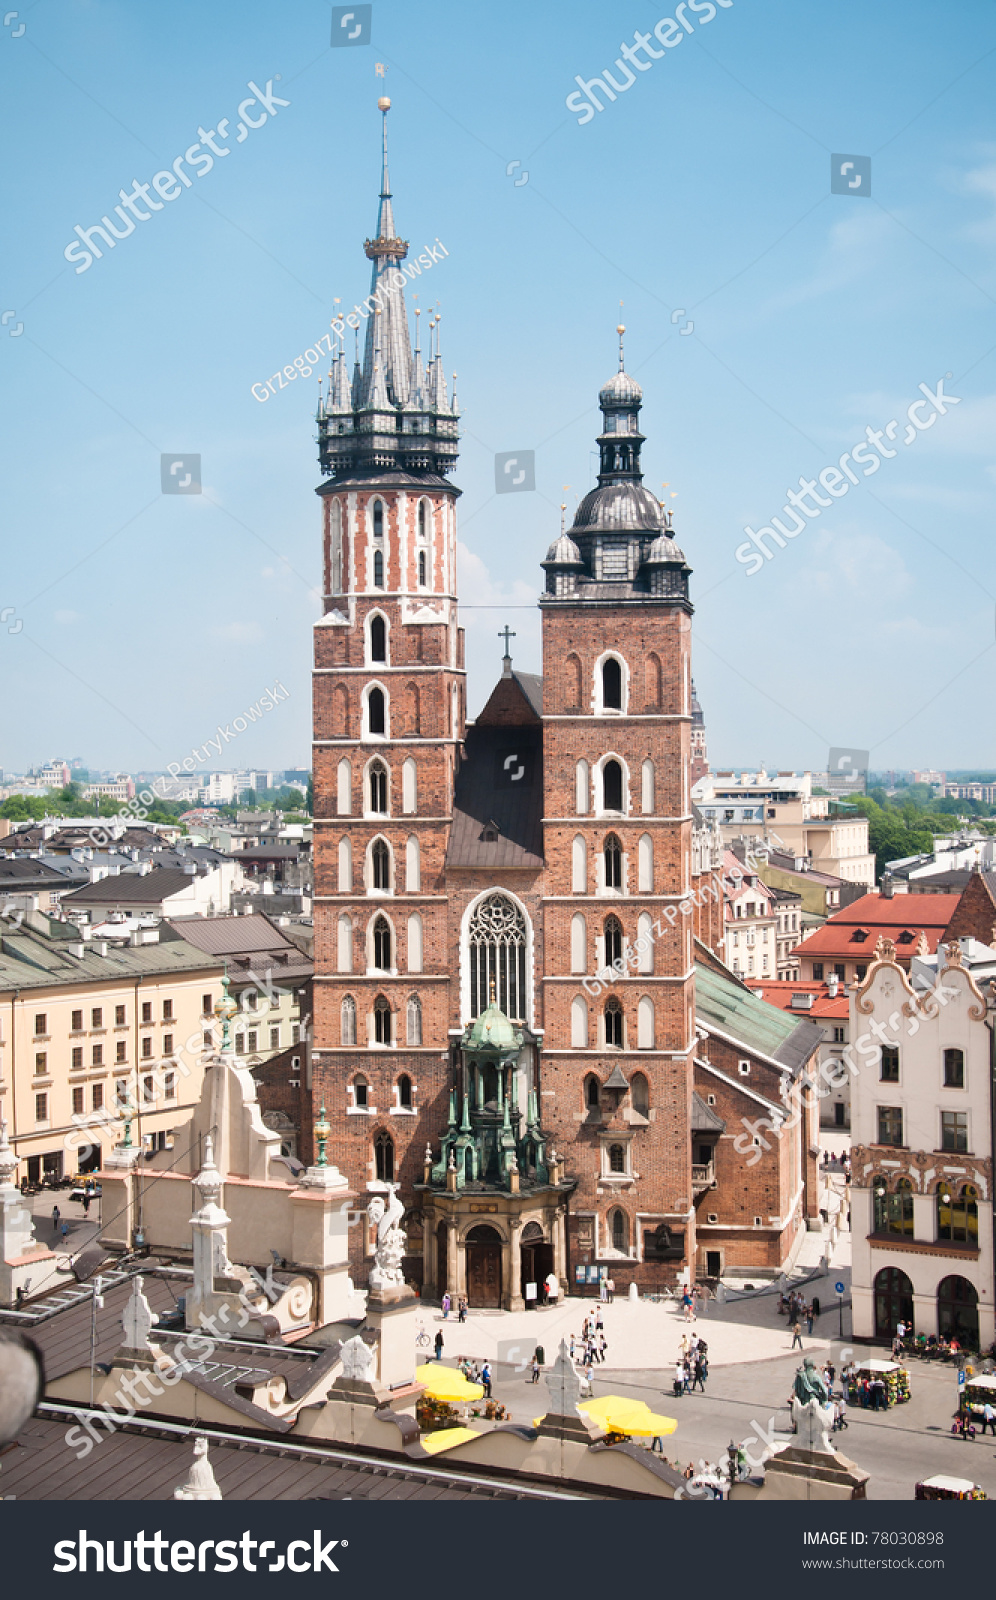 View At St. Mary'S Church, Famous Landmark In Krakow, Poland. Stock Photo 78030898 : Shutterstock